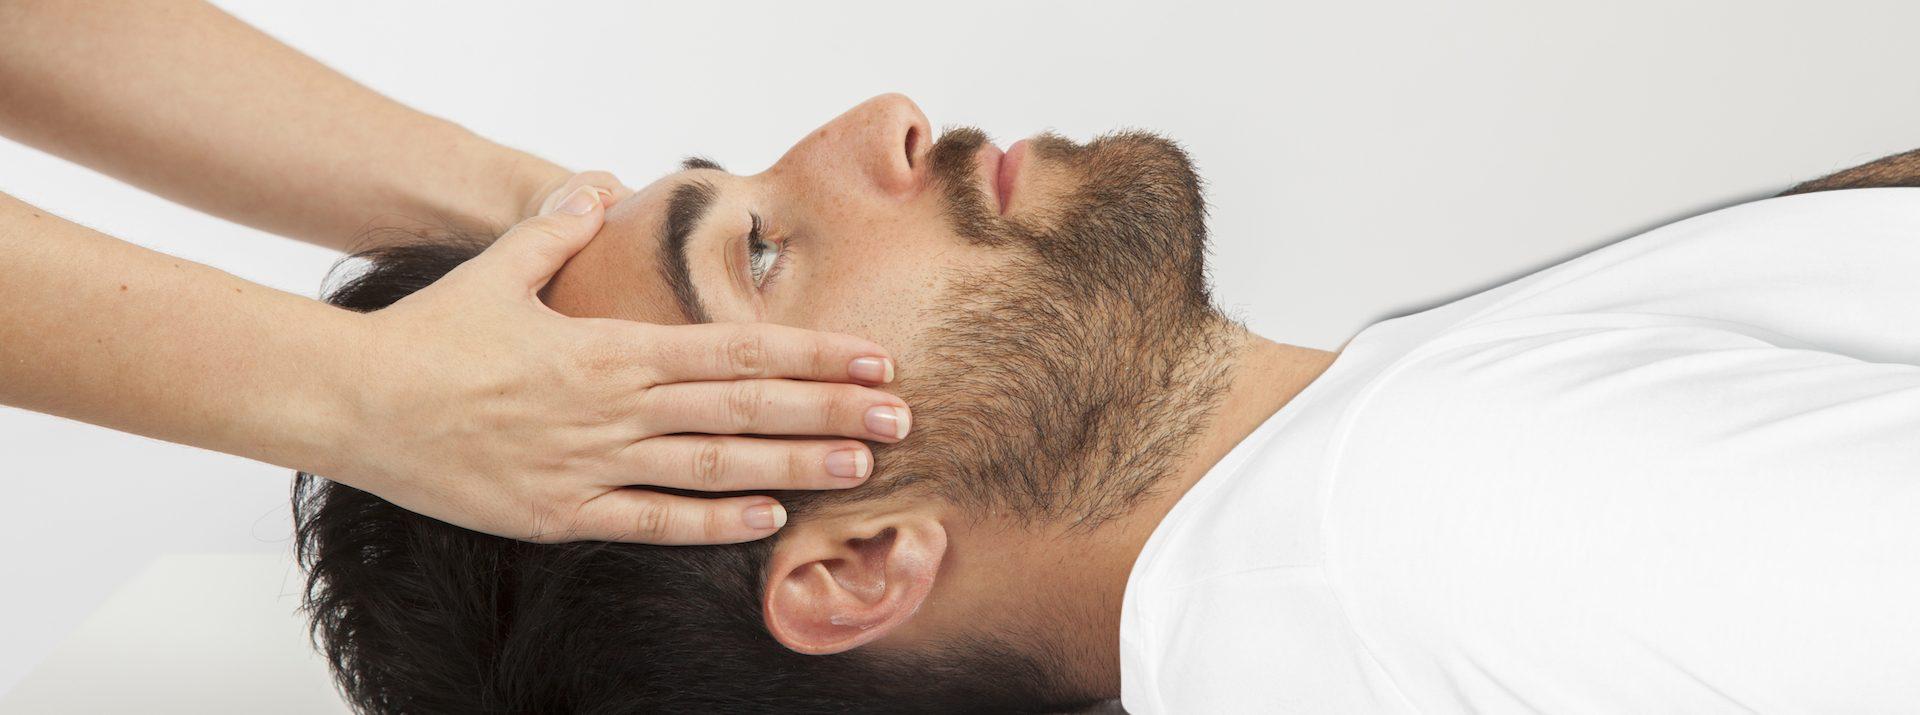 Oedeemtherapie oedeembehandeling oedeemtherapeut huidtherapeut Huidtotaal Huidtherapie Arnhem